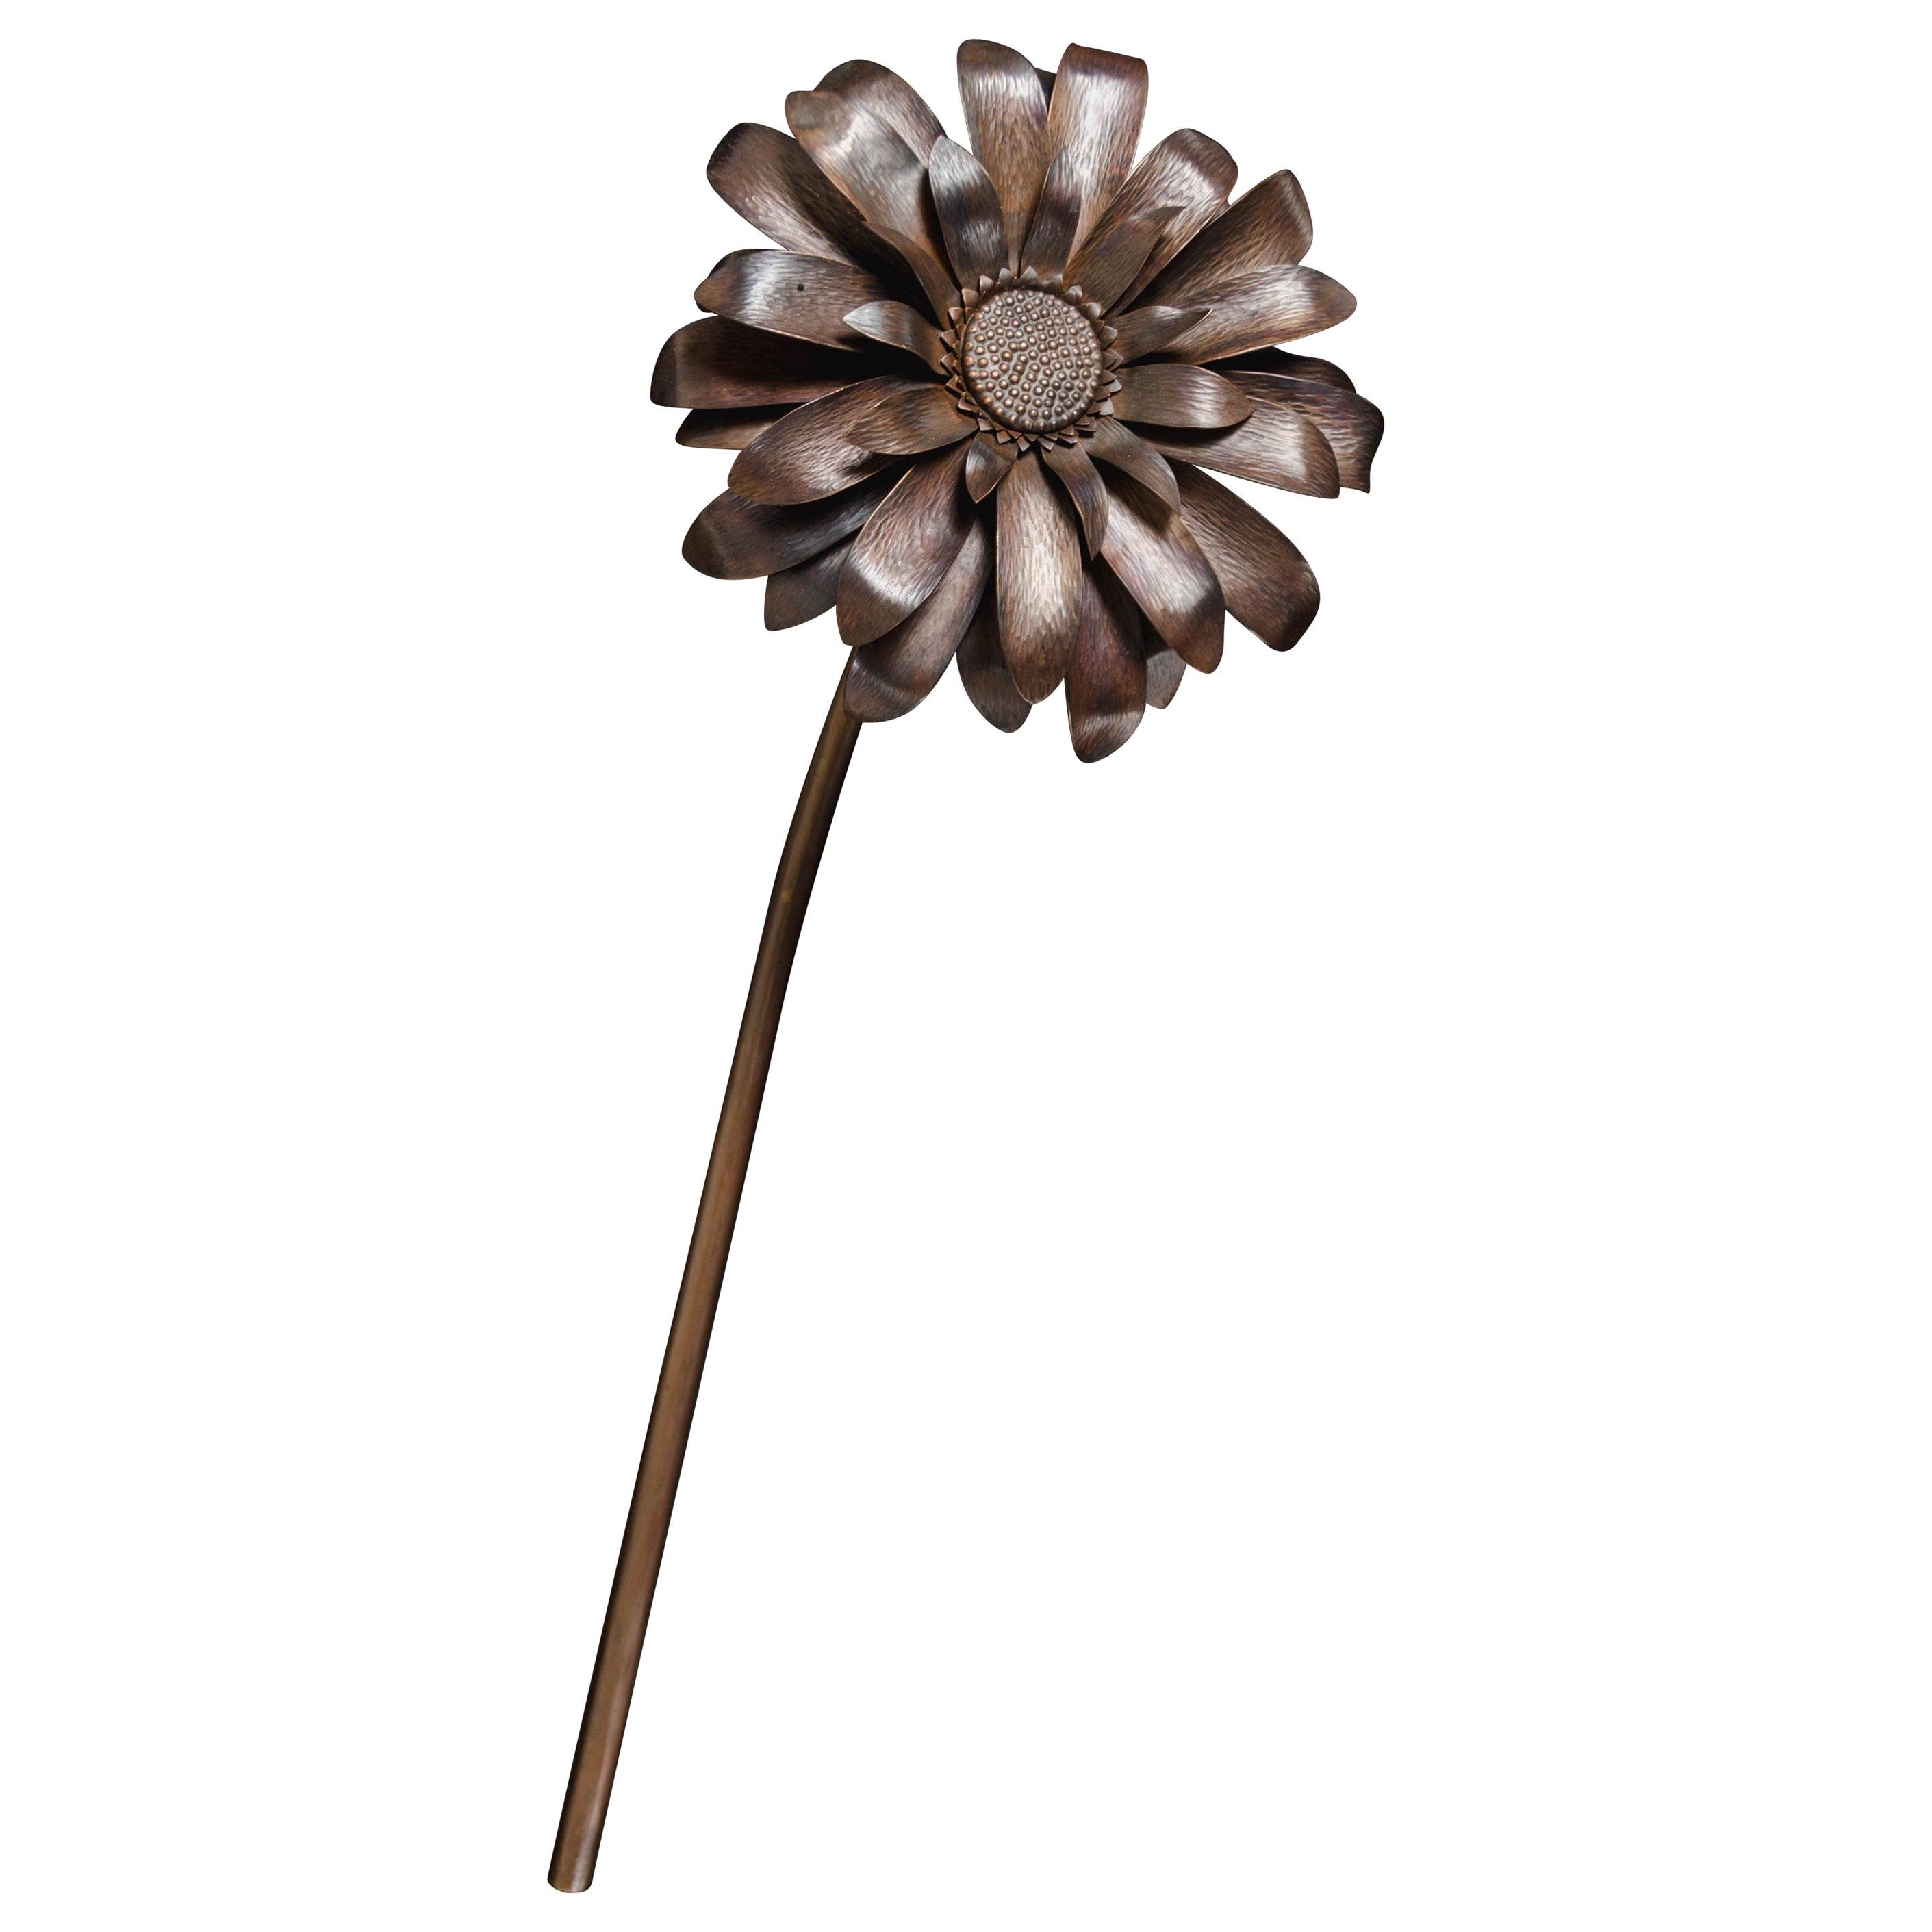 Gerber Daisy Flower Sculpture, Antique Copper by Robert Kuo, Hand Repousse